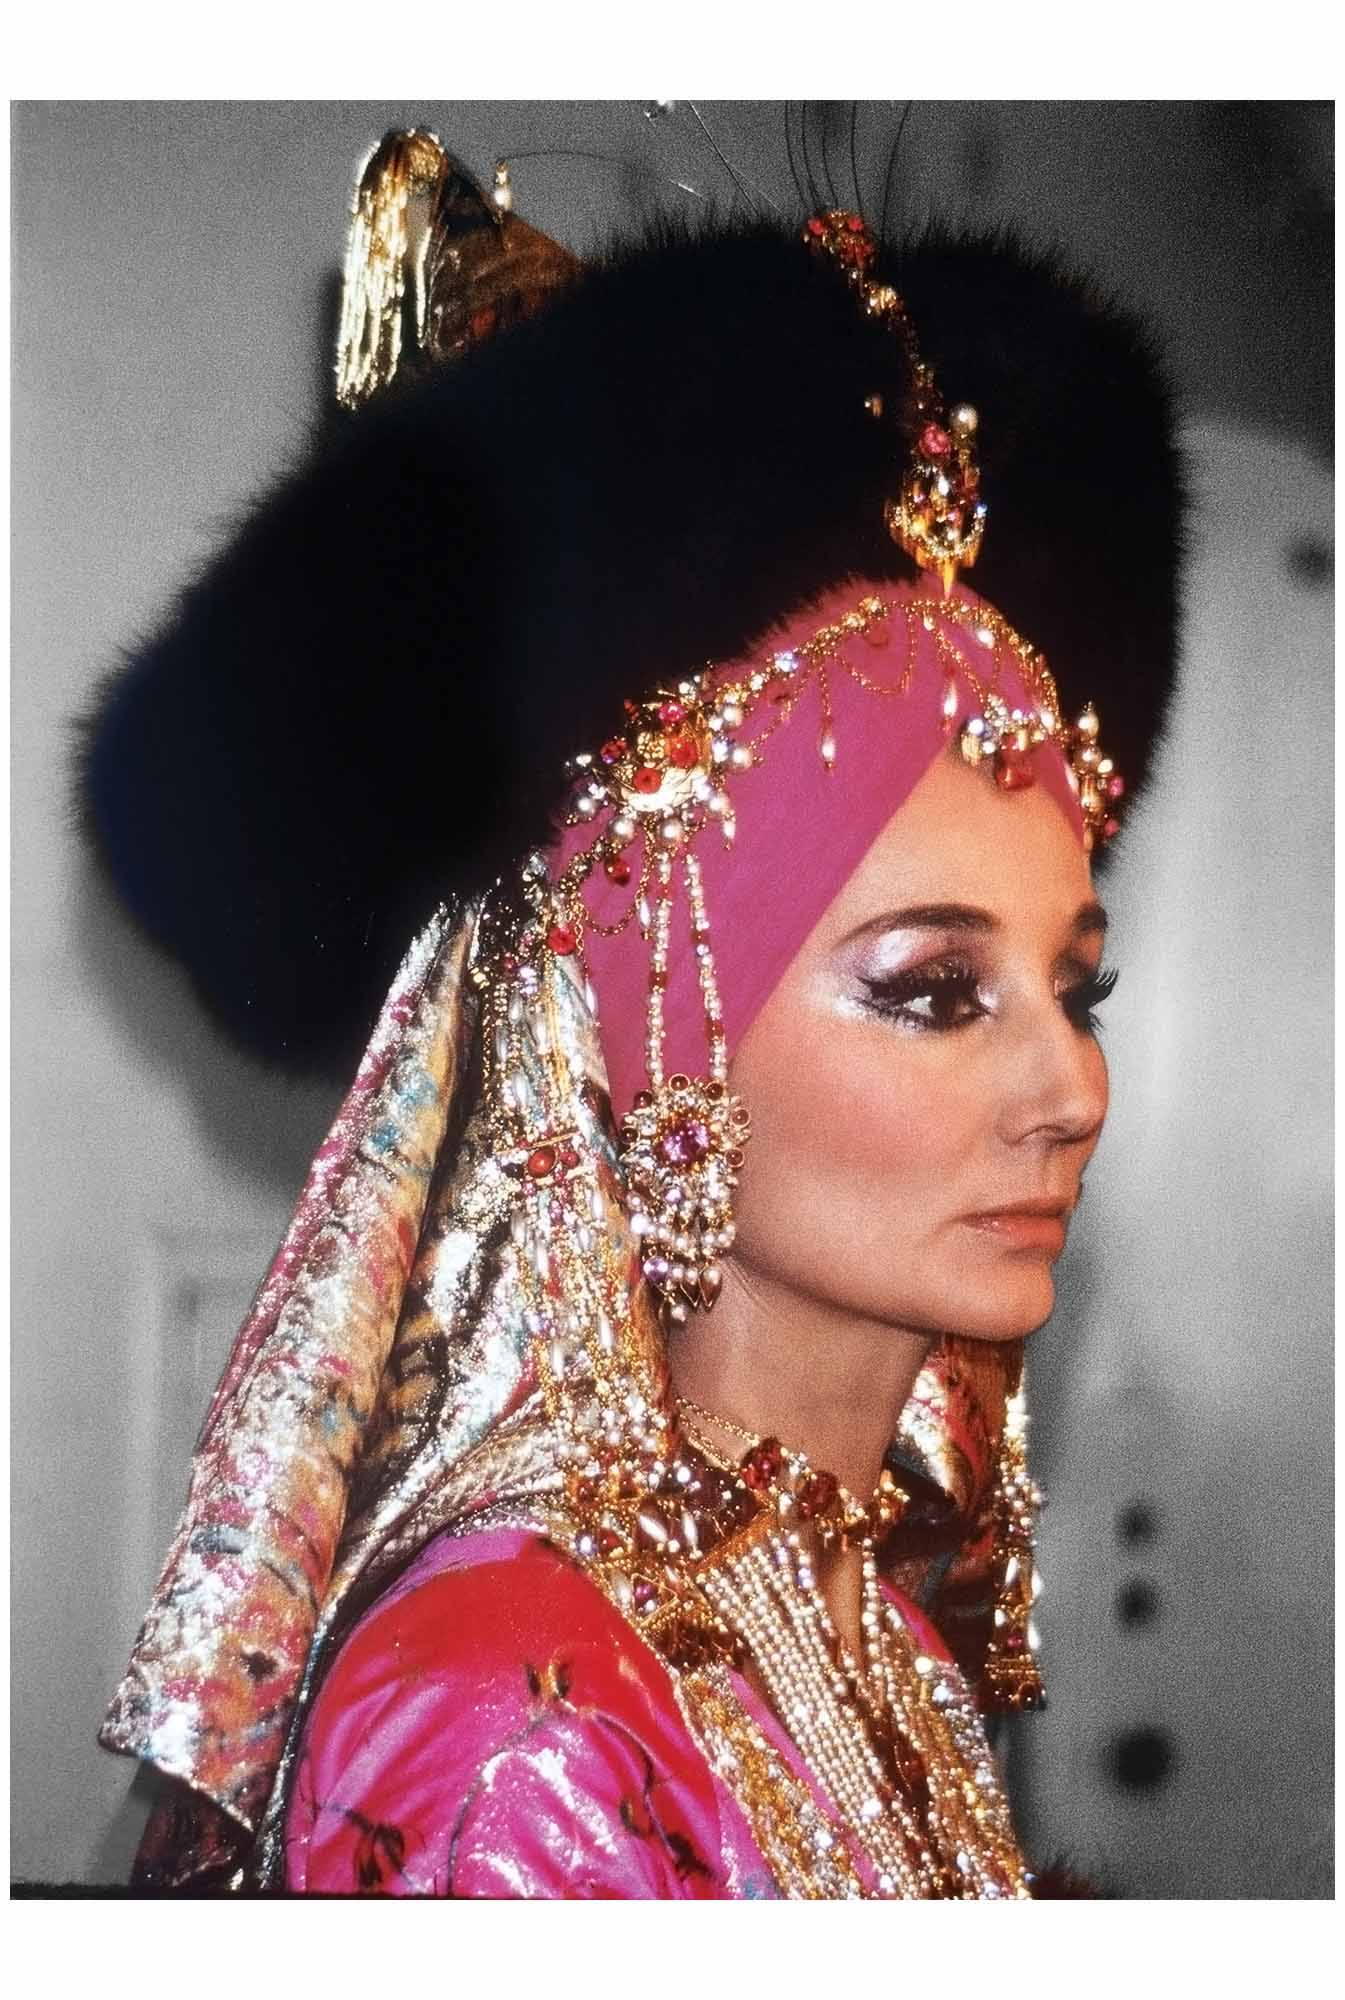 jacqueline-de-ribes-in-costume-for-the-e2809cbal-oriental-paris-1969